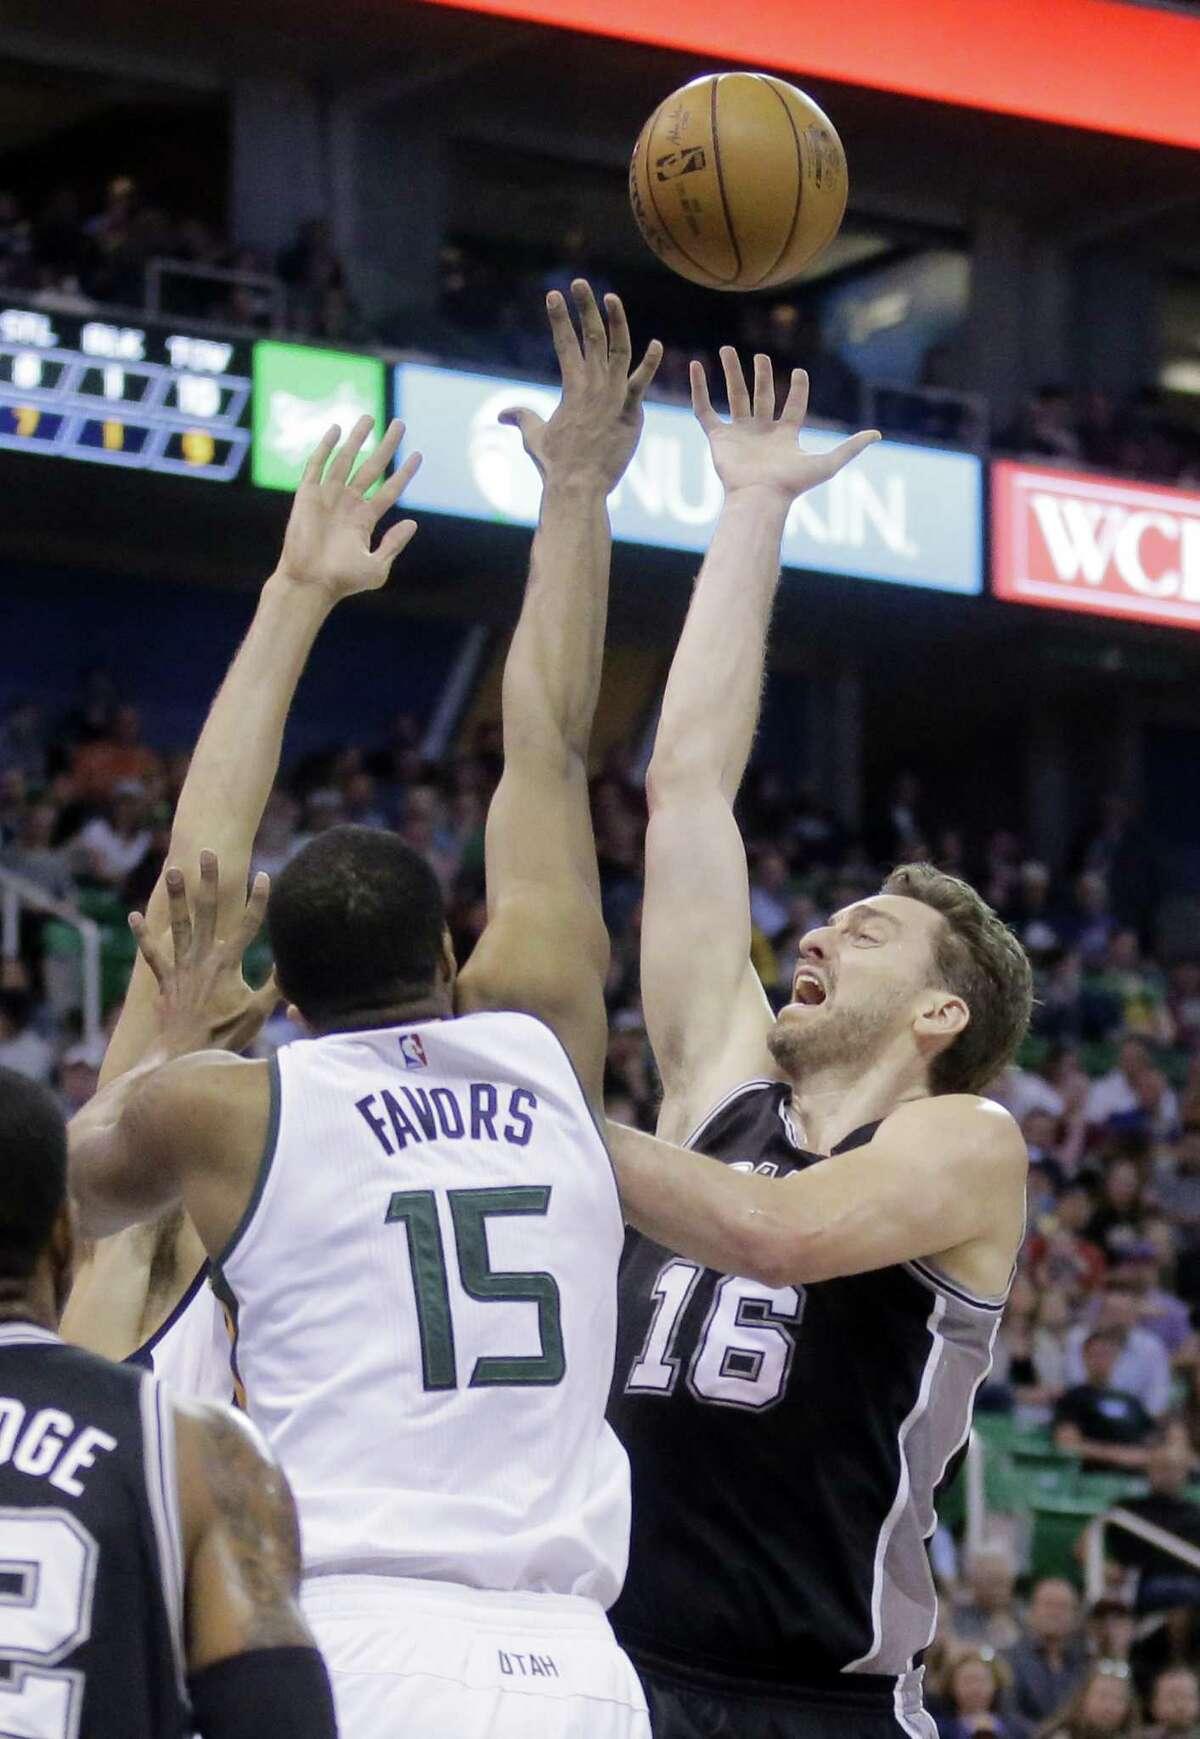 Spurs center Pau Gasol (16) shoots as Utah Jazz forward Derrick Favors (15) defends during the first half on April 12, 2017, in Salt Lake City.